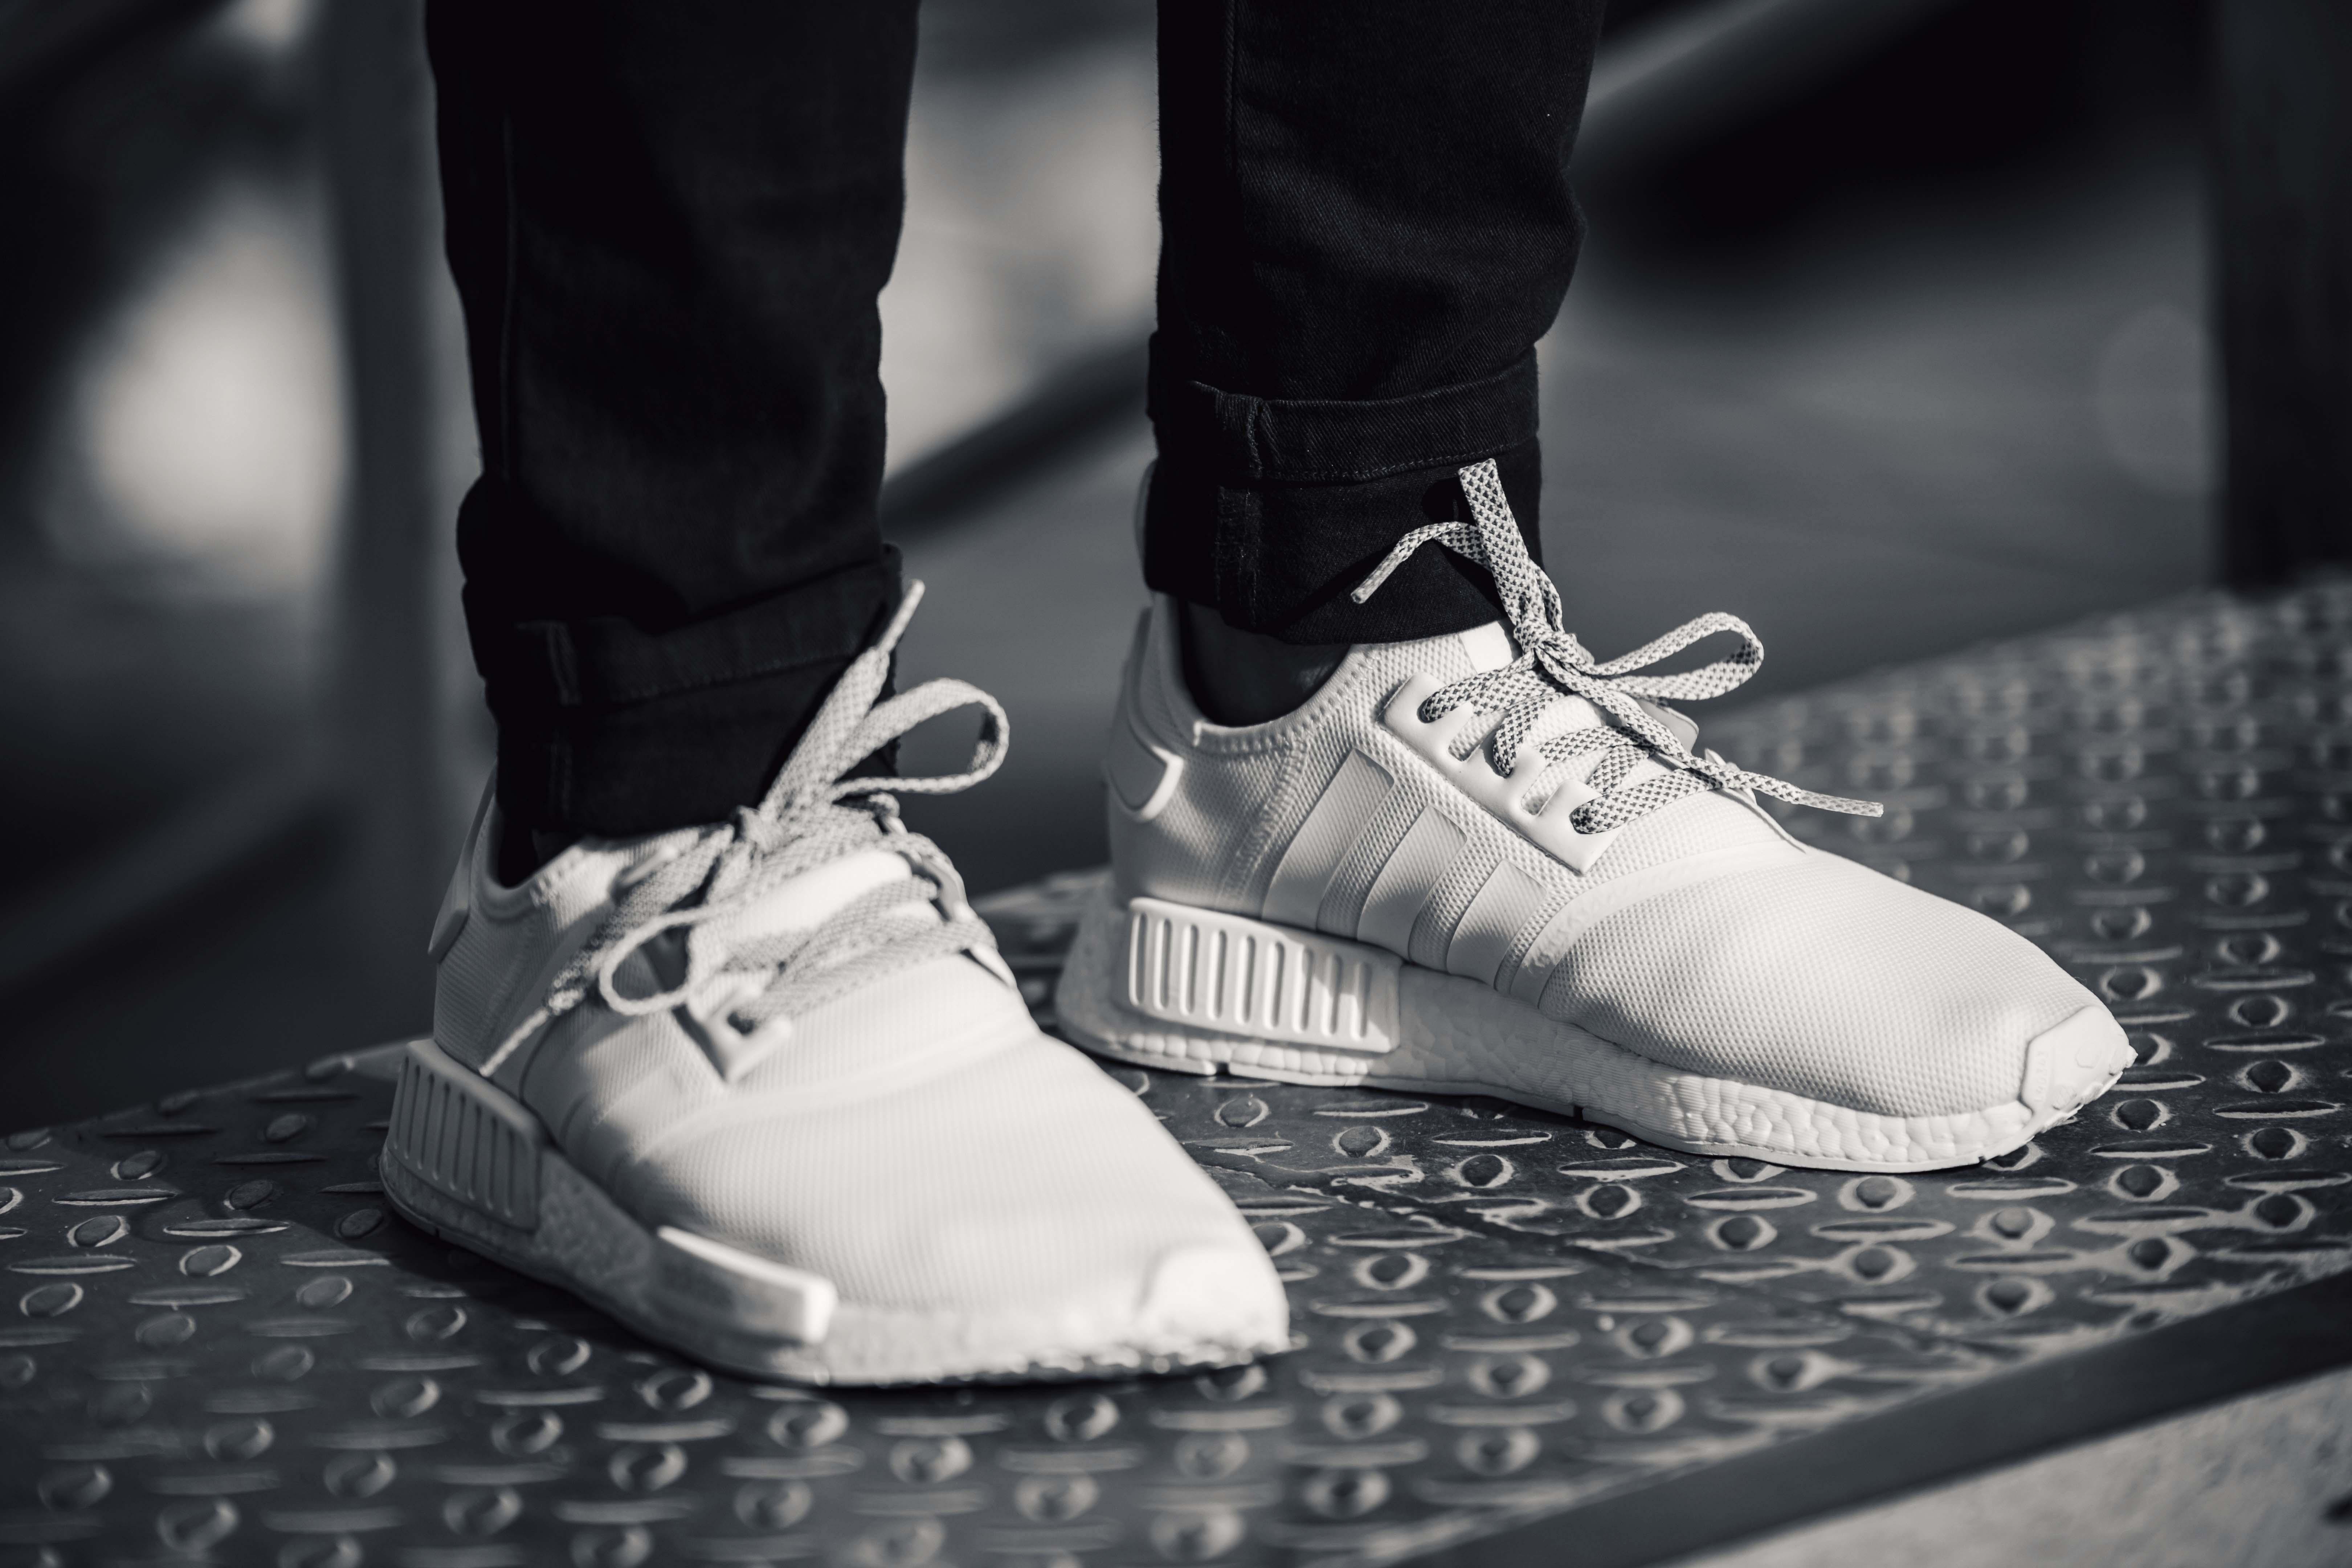 7e8d3f711d9c3 ... switzerland adidas originals nmd triple white 0643e aa419